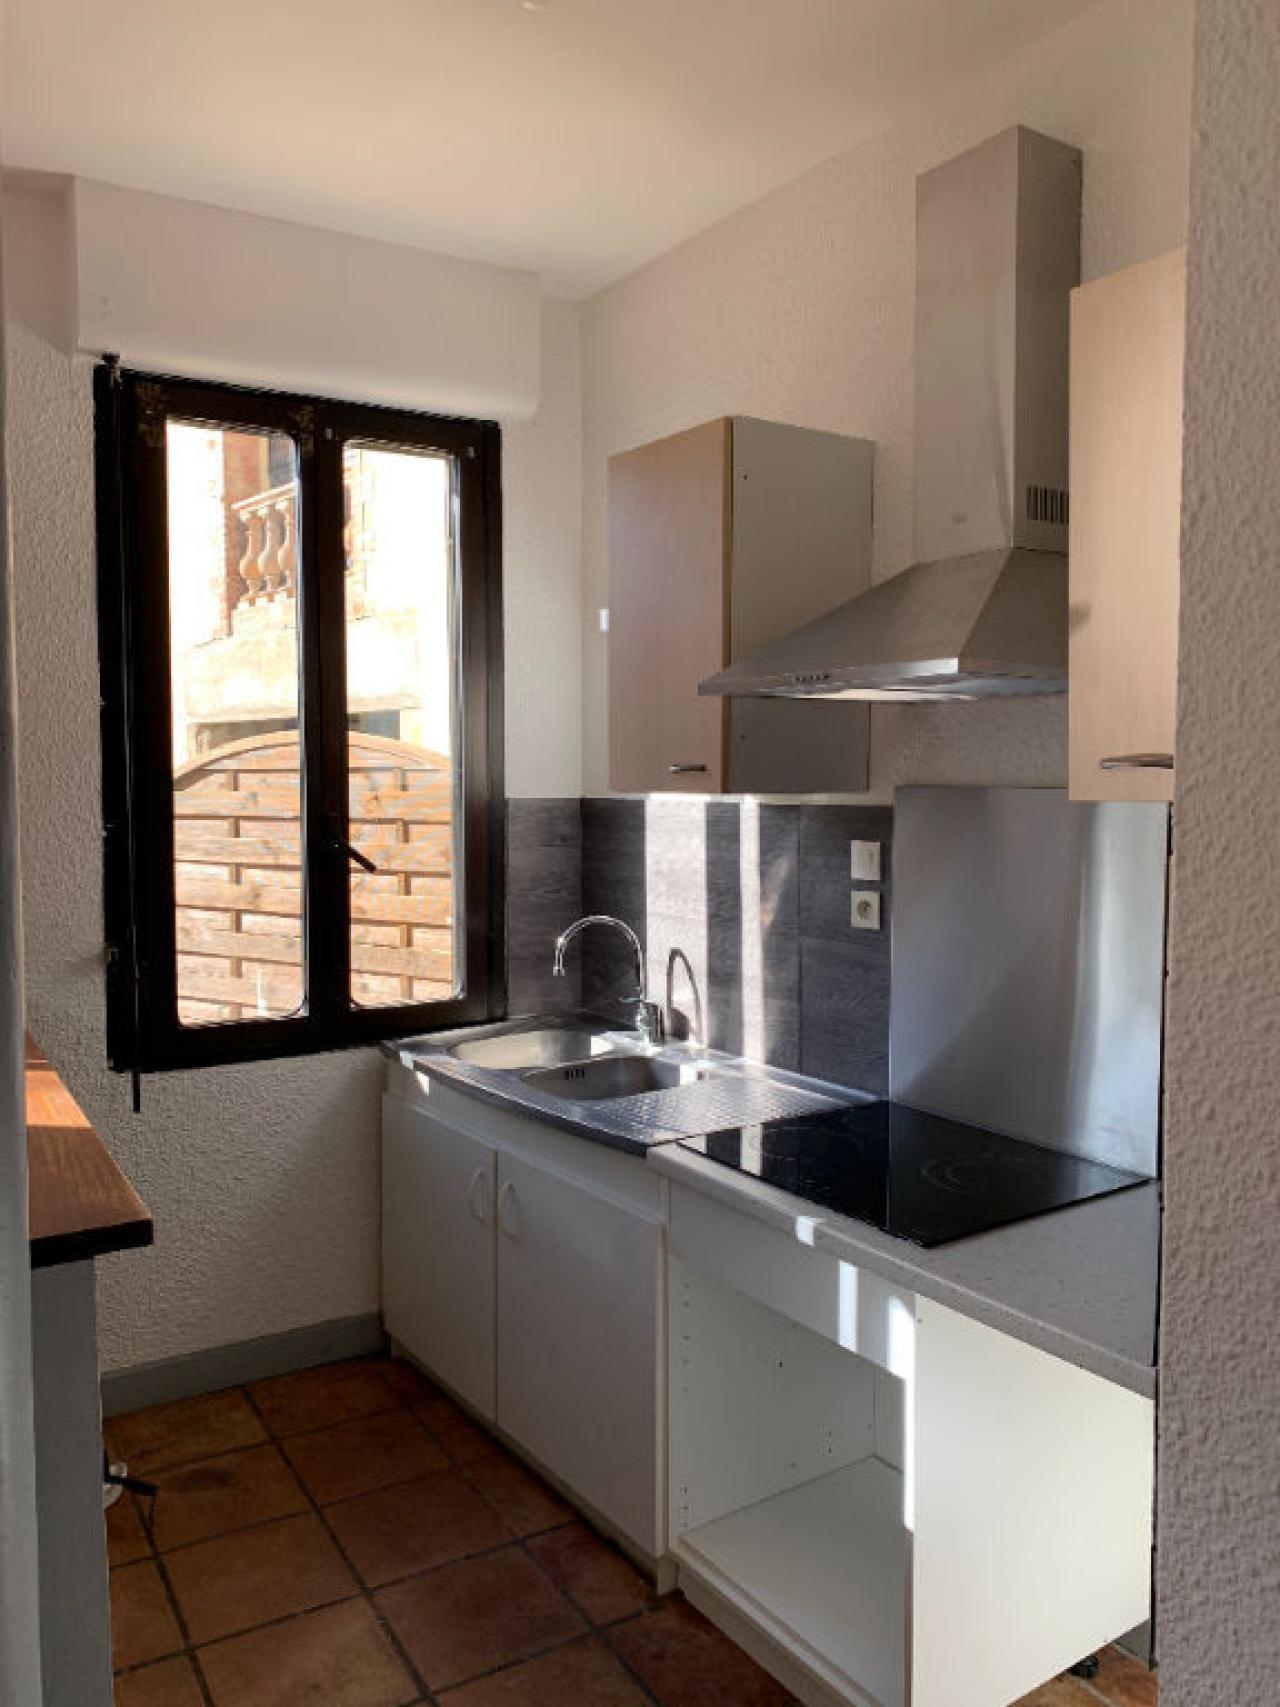 Apartment CARCASSONNE | 400 € / month